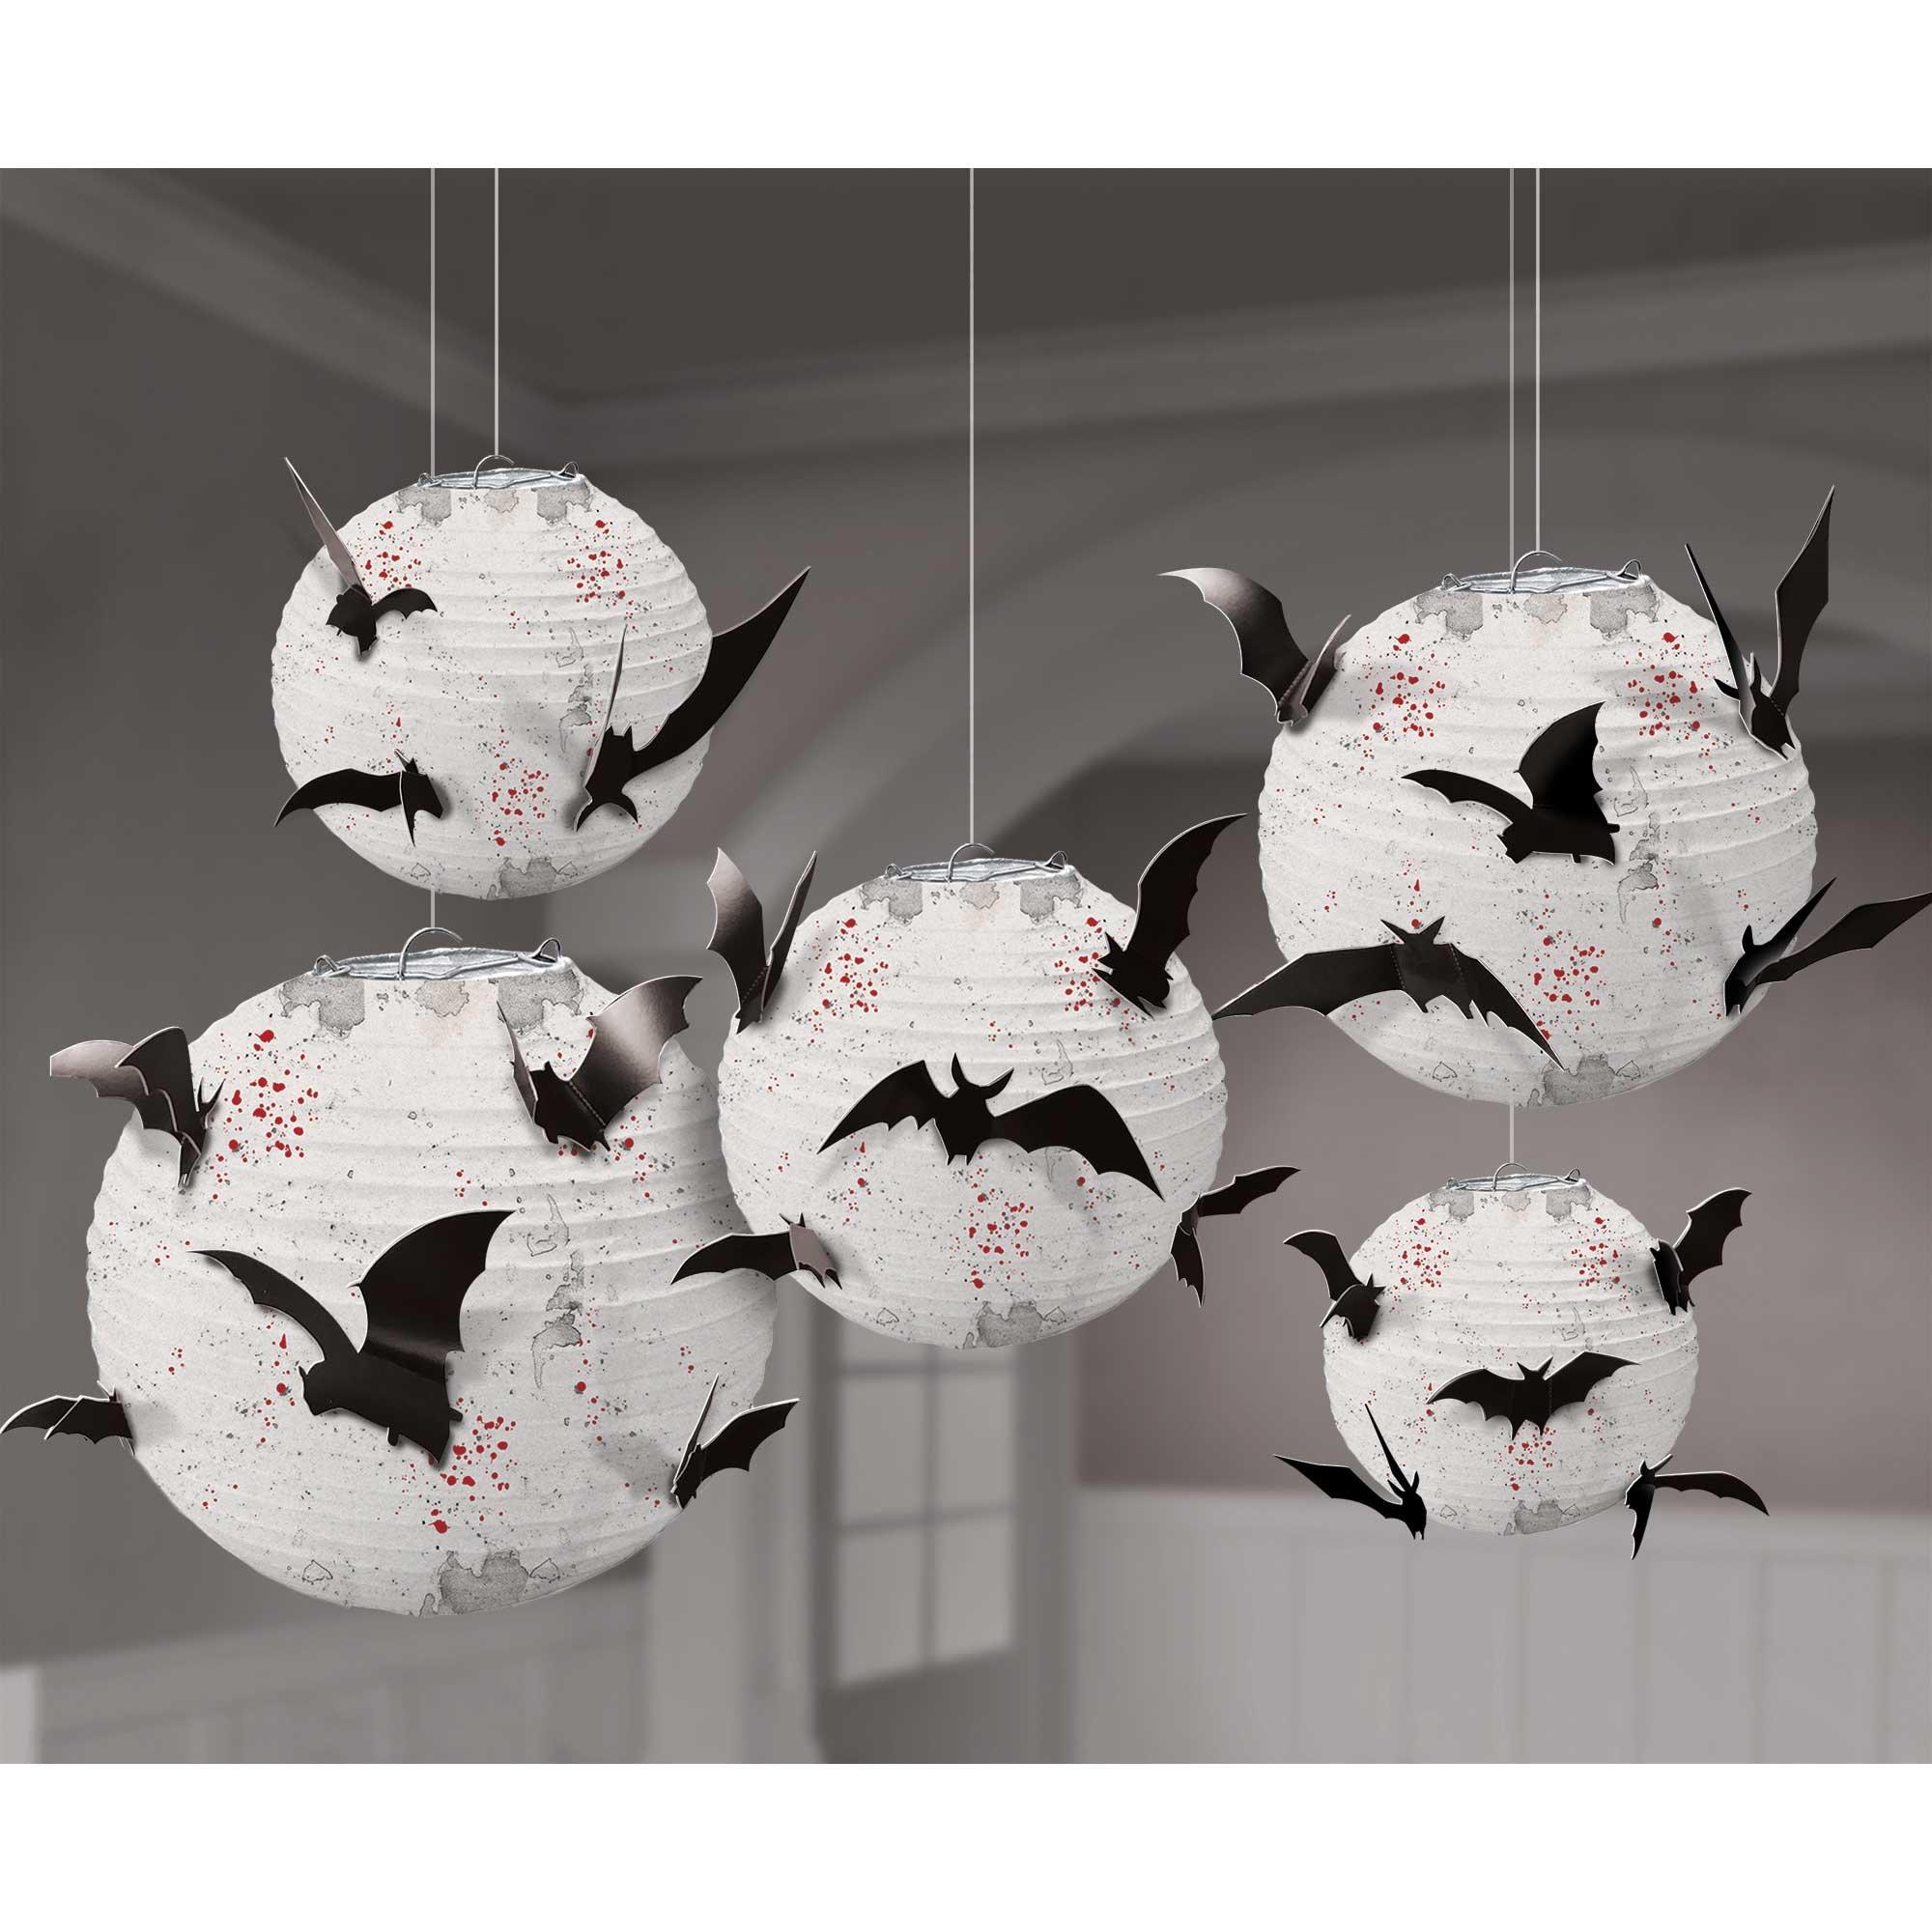 Dark Manor Paper Lanterns & Cardboard Bats